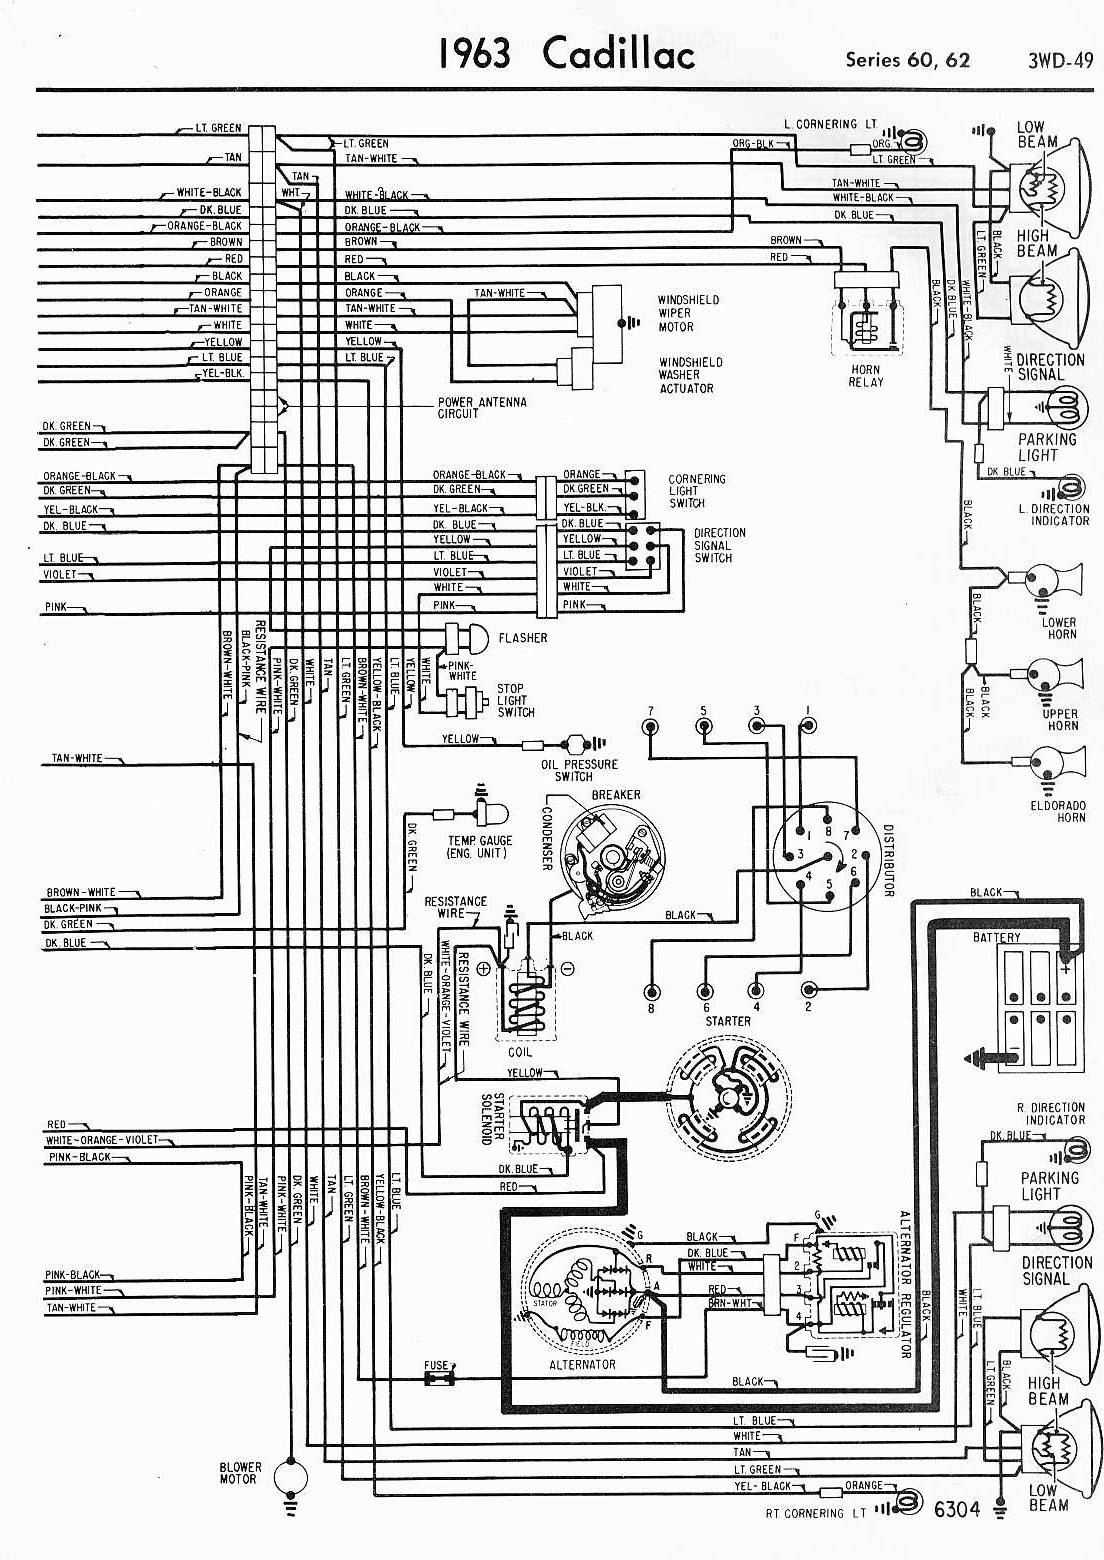 1982 cadillac wiring diagram wiring info u2022 rh cardsbox co SBC Distributor Wiring Diagram Distributor Wiring Diagram